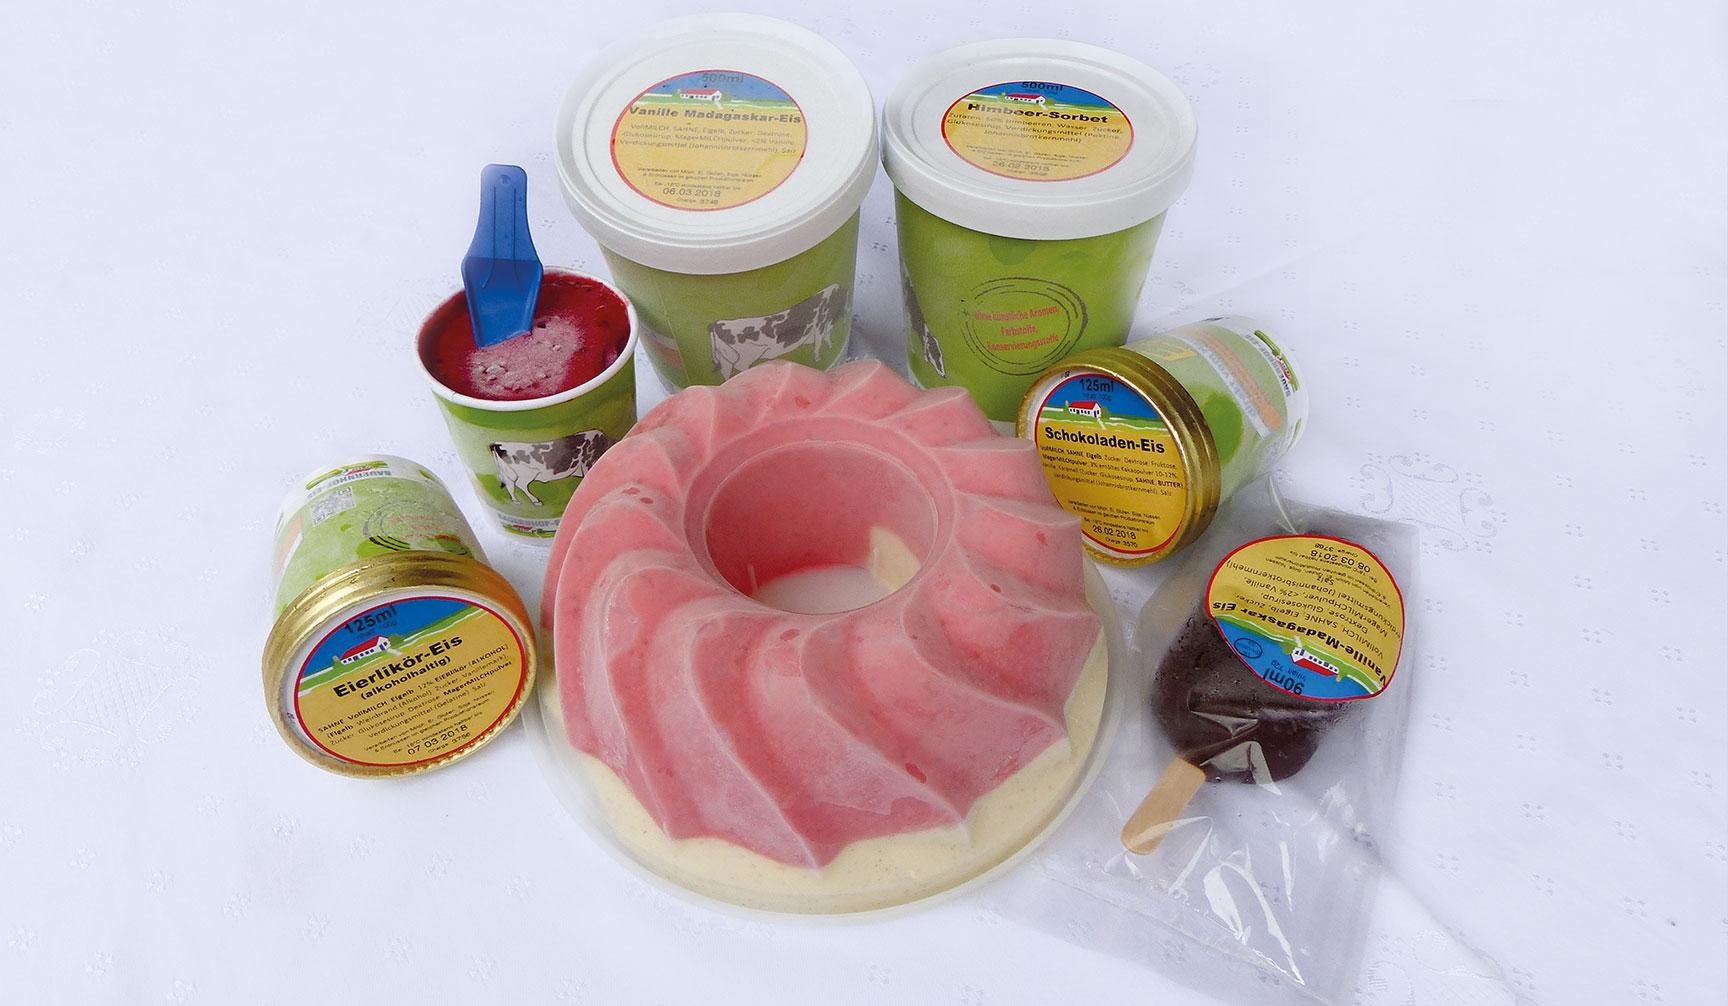 Eissorten Haselstaller Hof